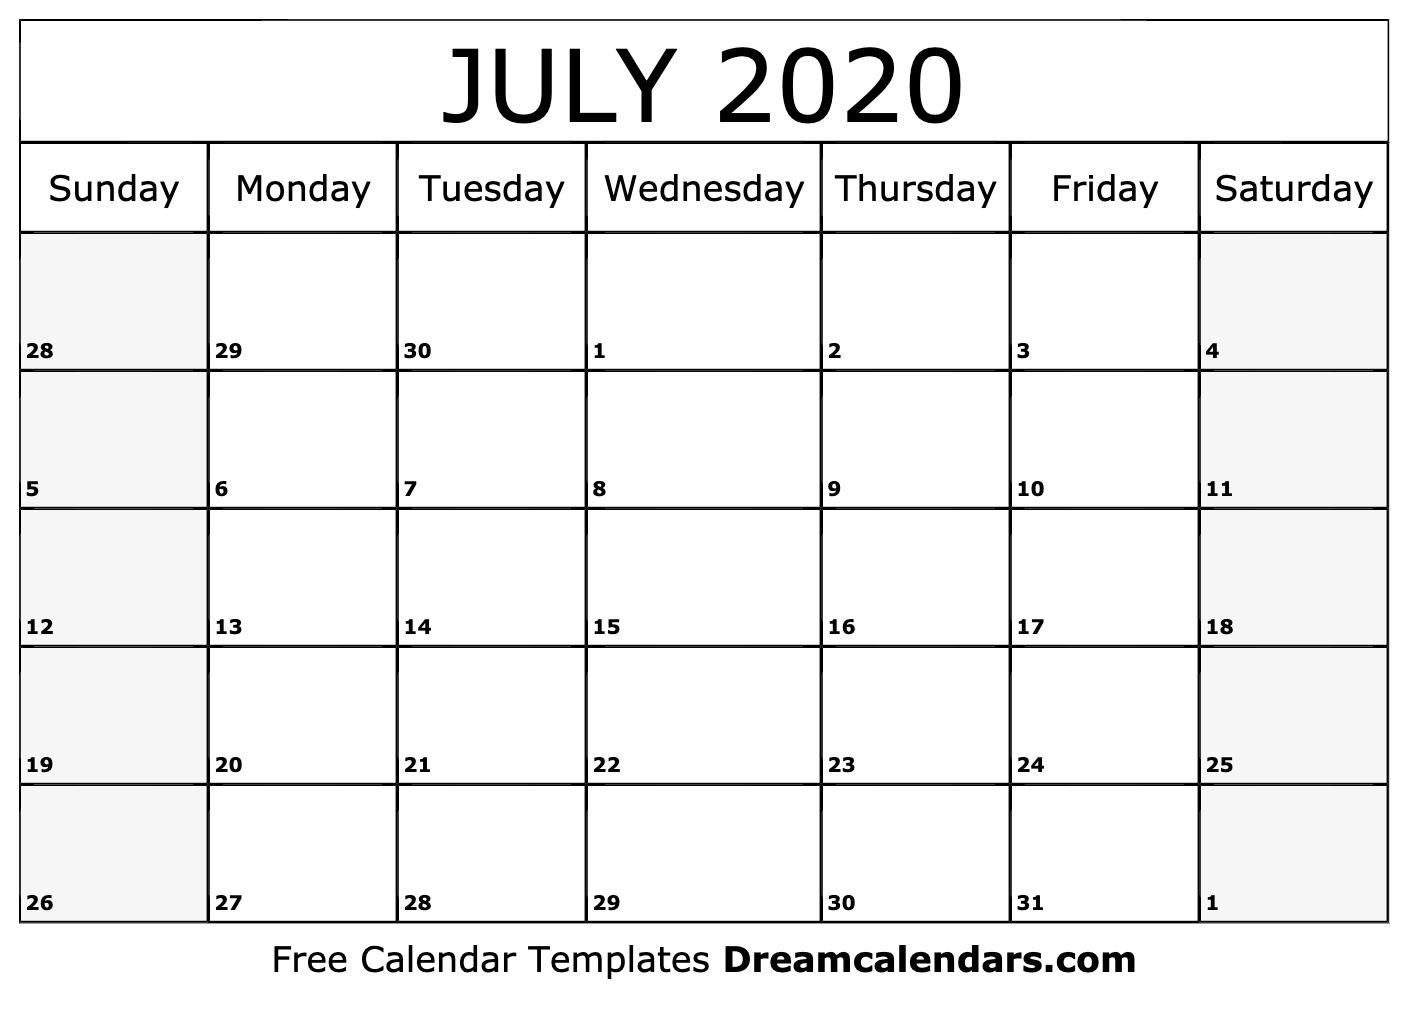 Ko-Fi - Printable July 2020 Calendar - Ko-Fi ❤️ Where Creators Get